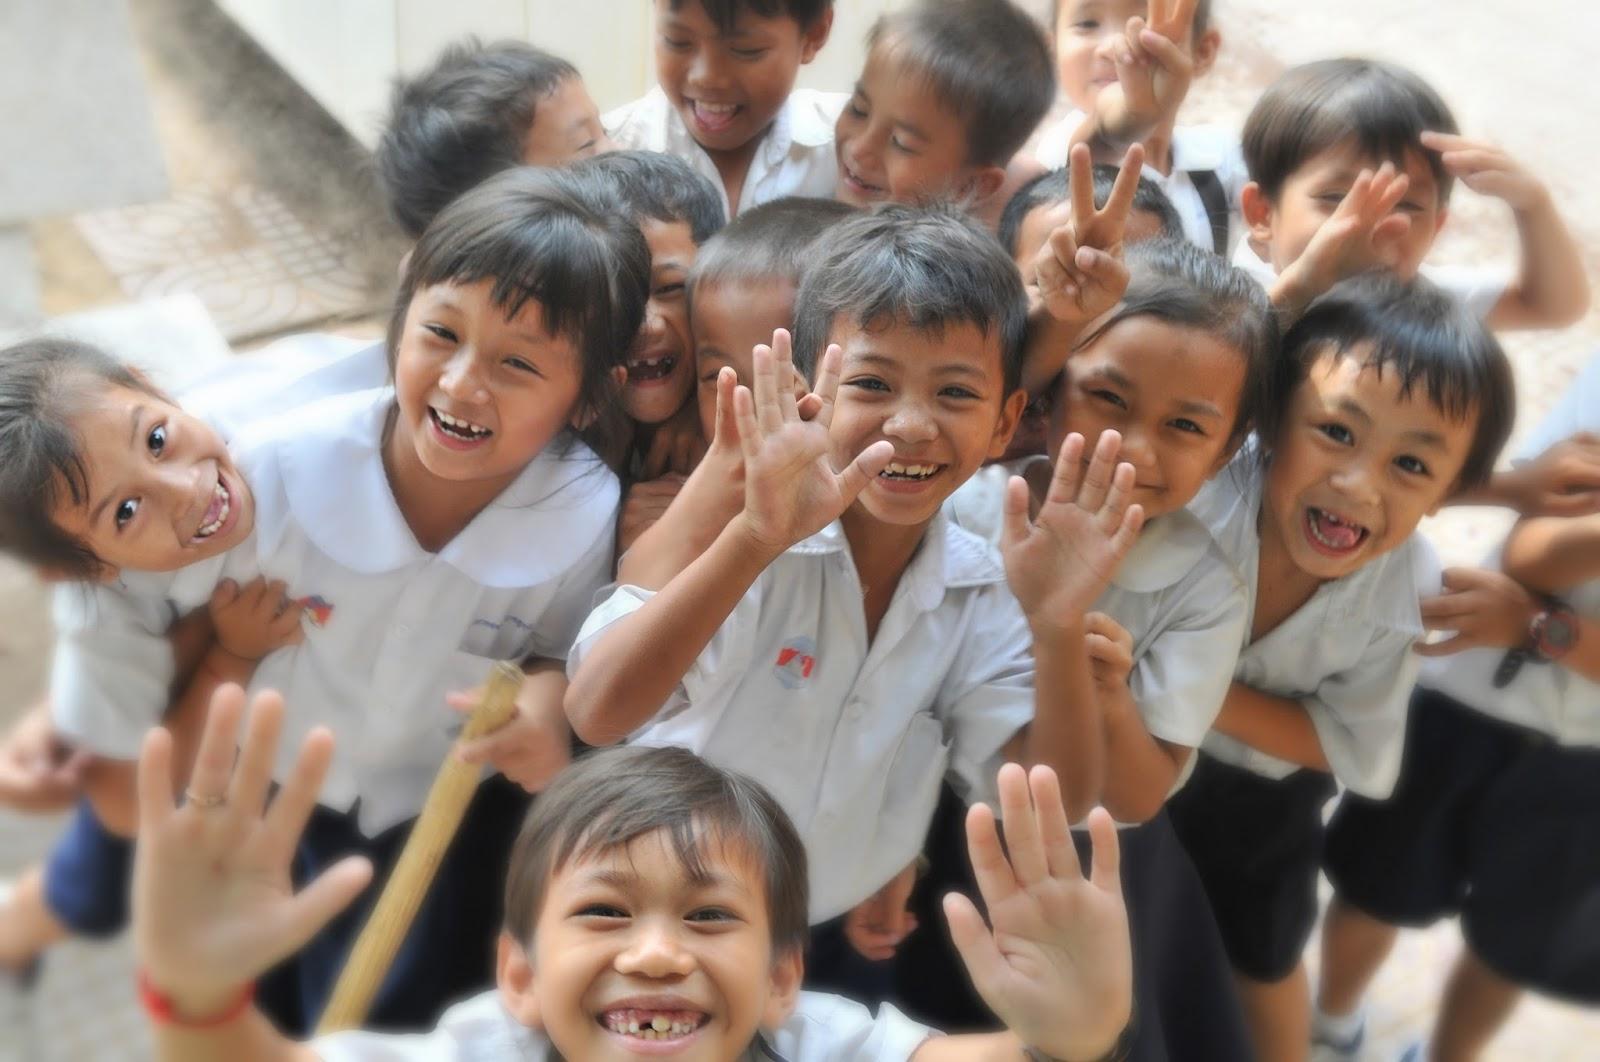 NAMC Montessori normalization elementary teacher laughing school children